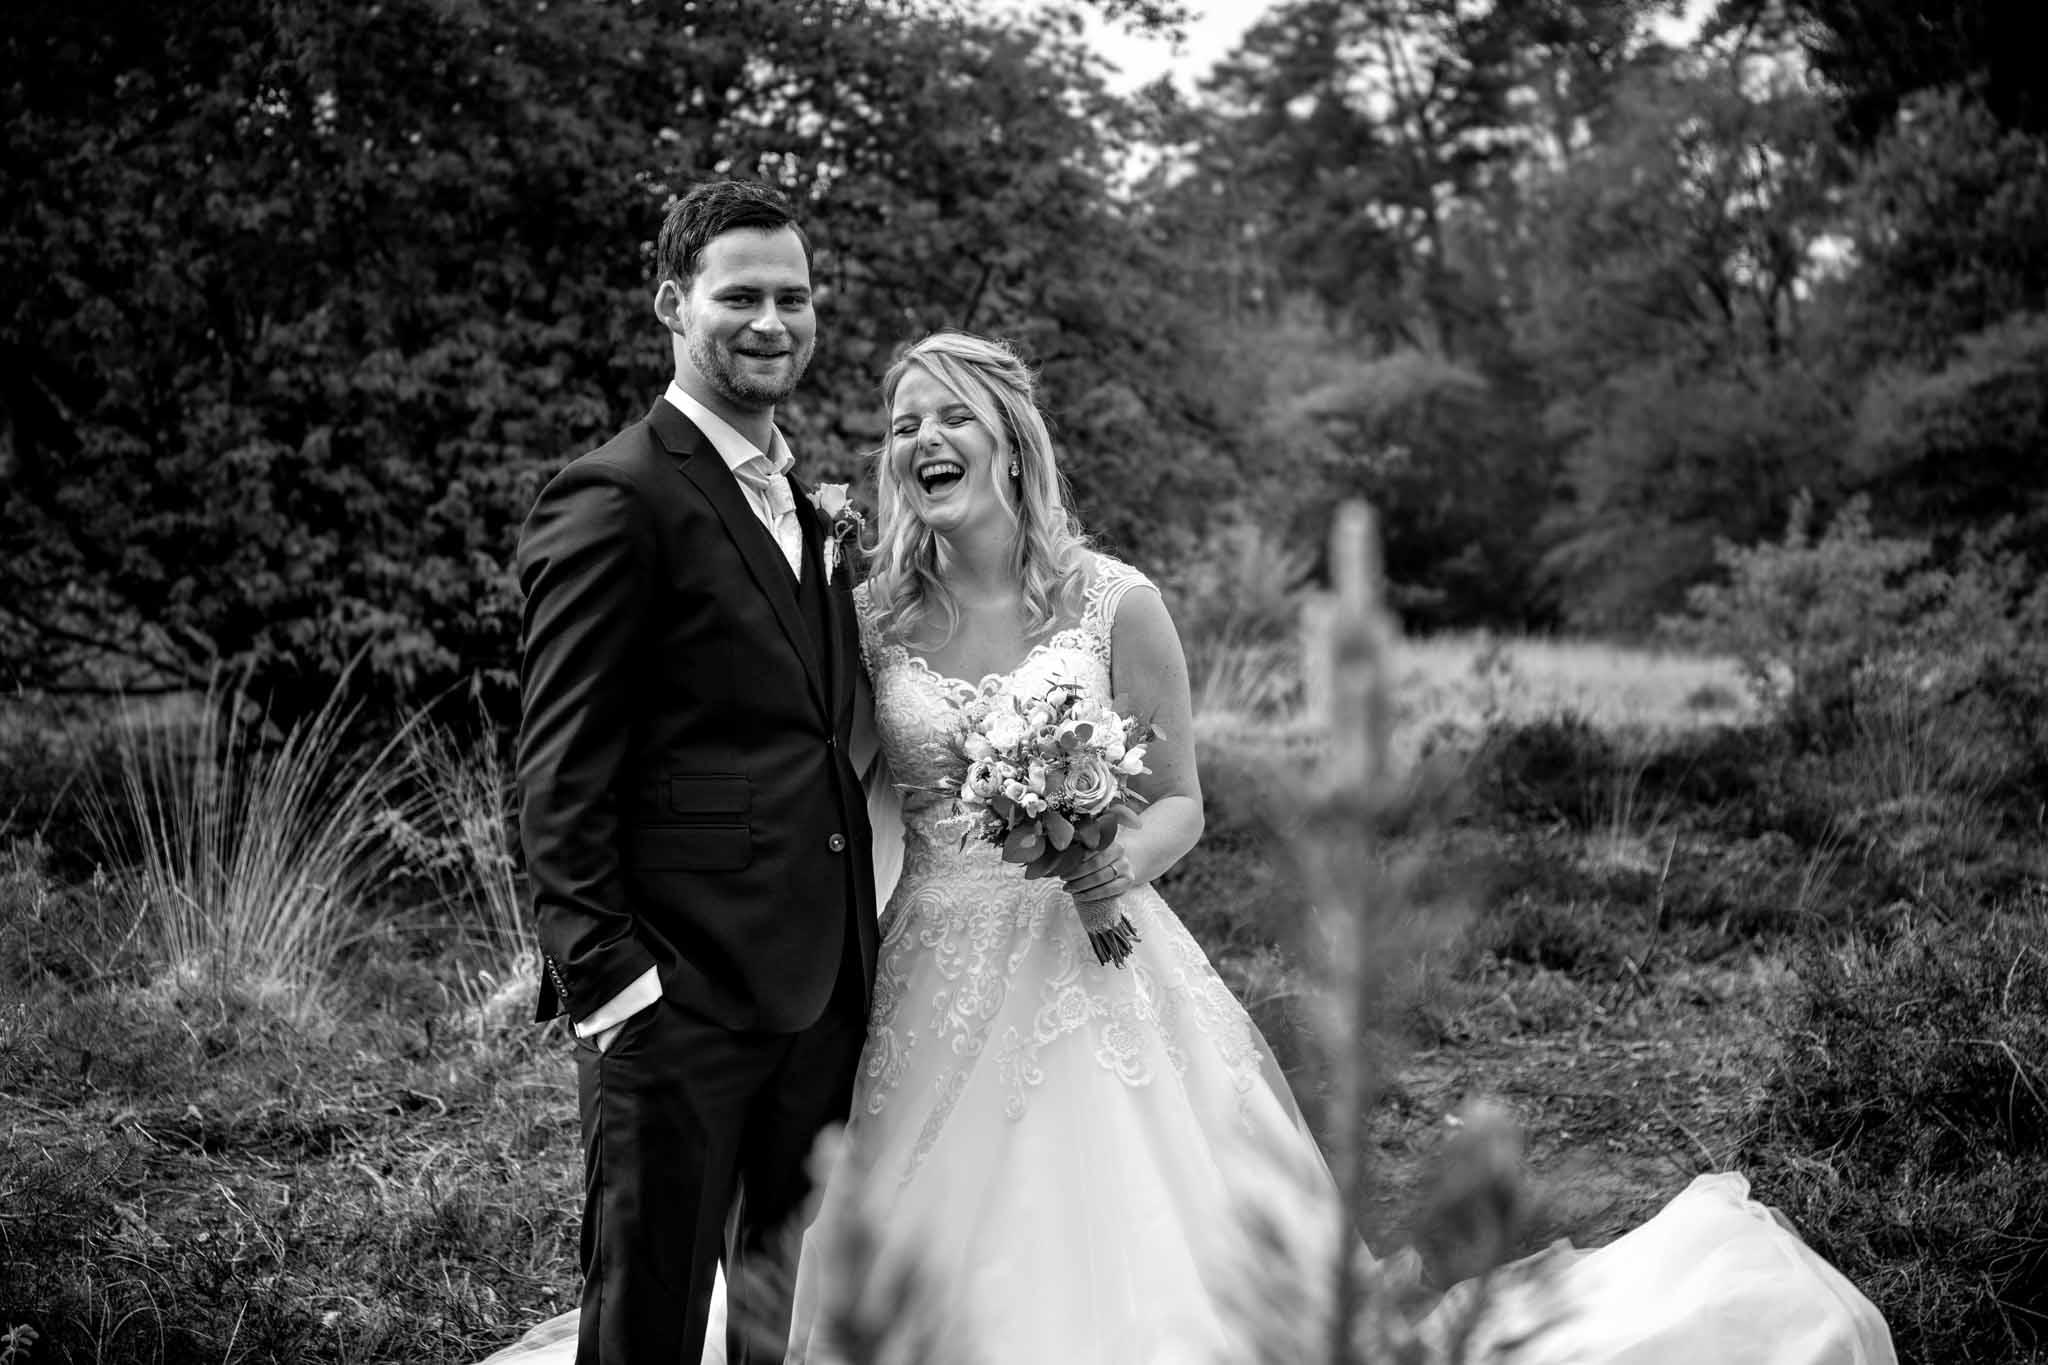 trouwfotografie, trouwreportage, trouwfotograaf, trouwfoto's, gelderland, storytime media